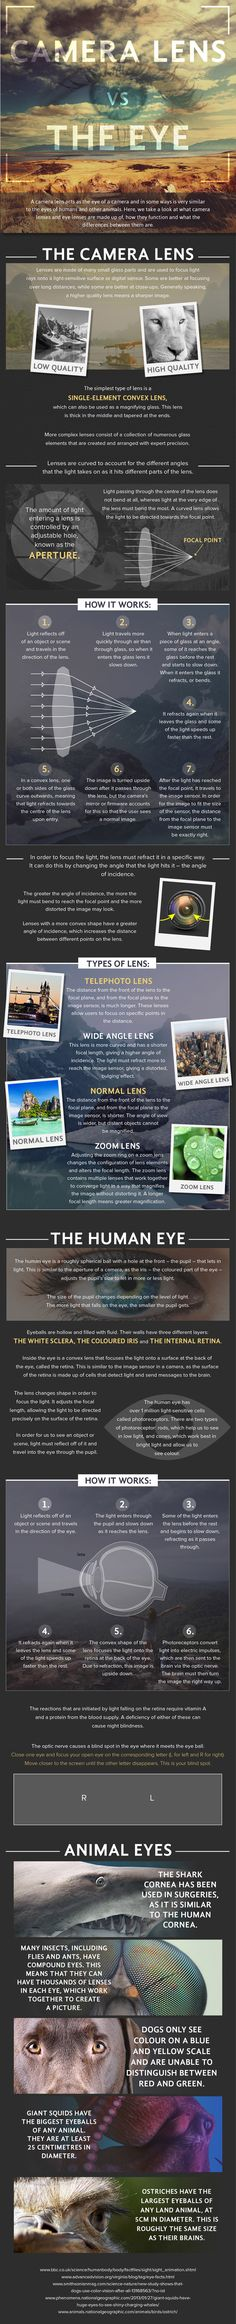 Lentes de cámara vs Ojo humano